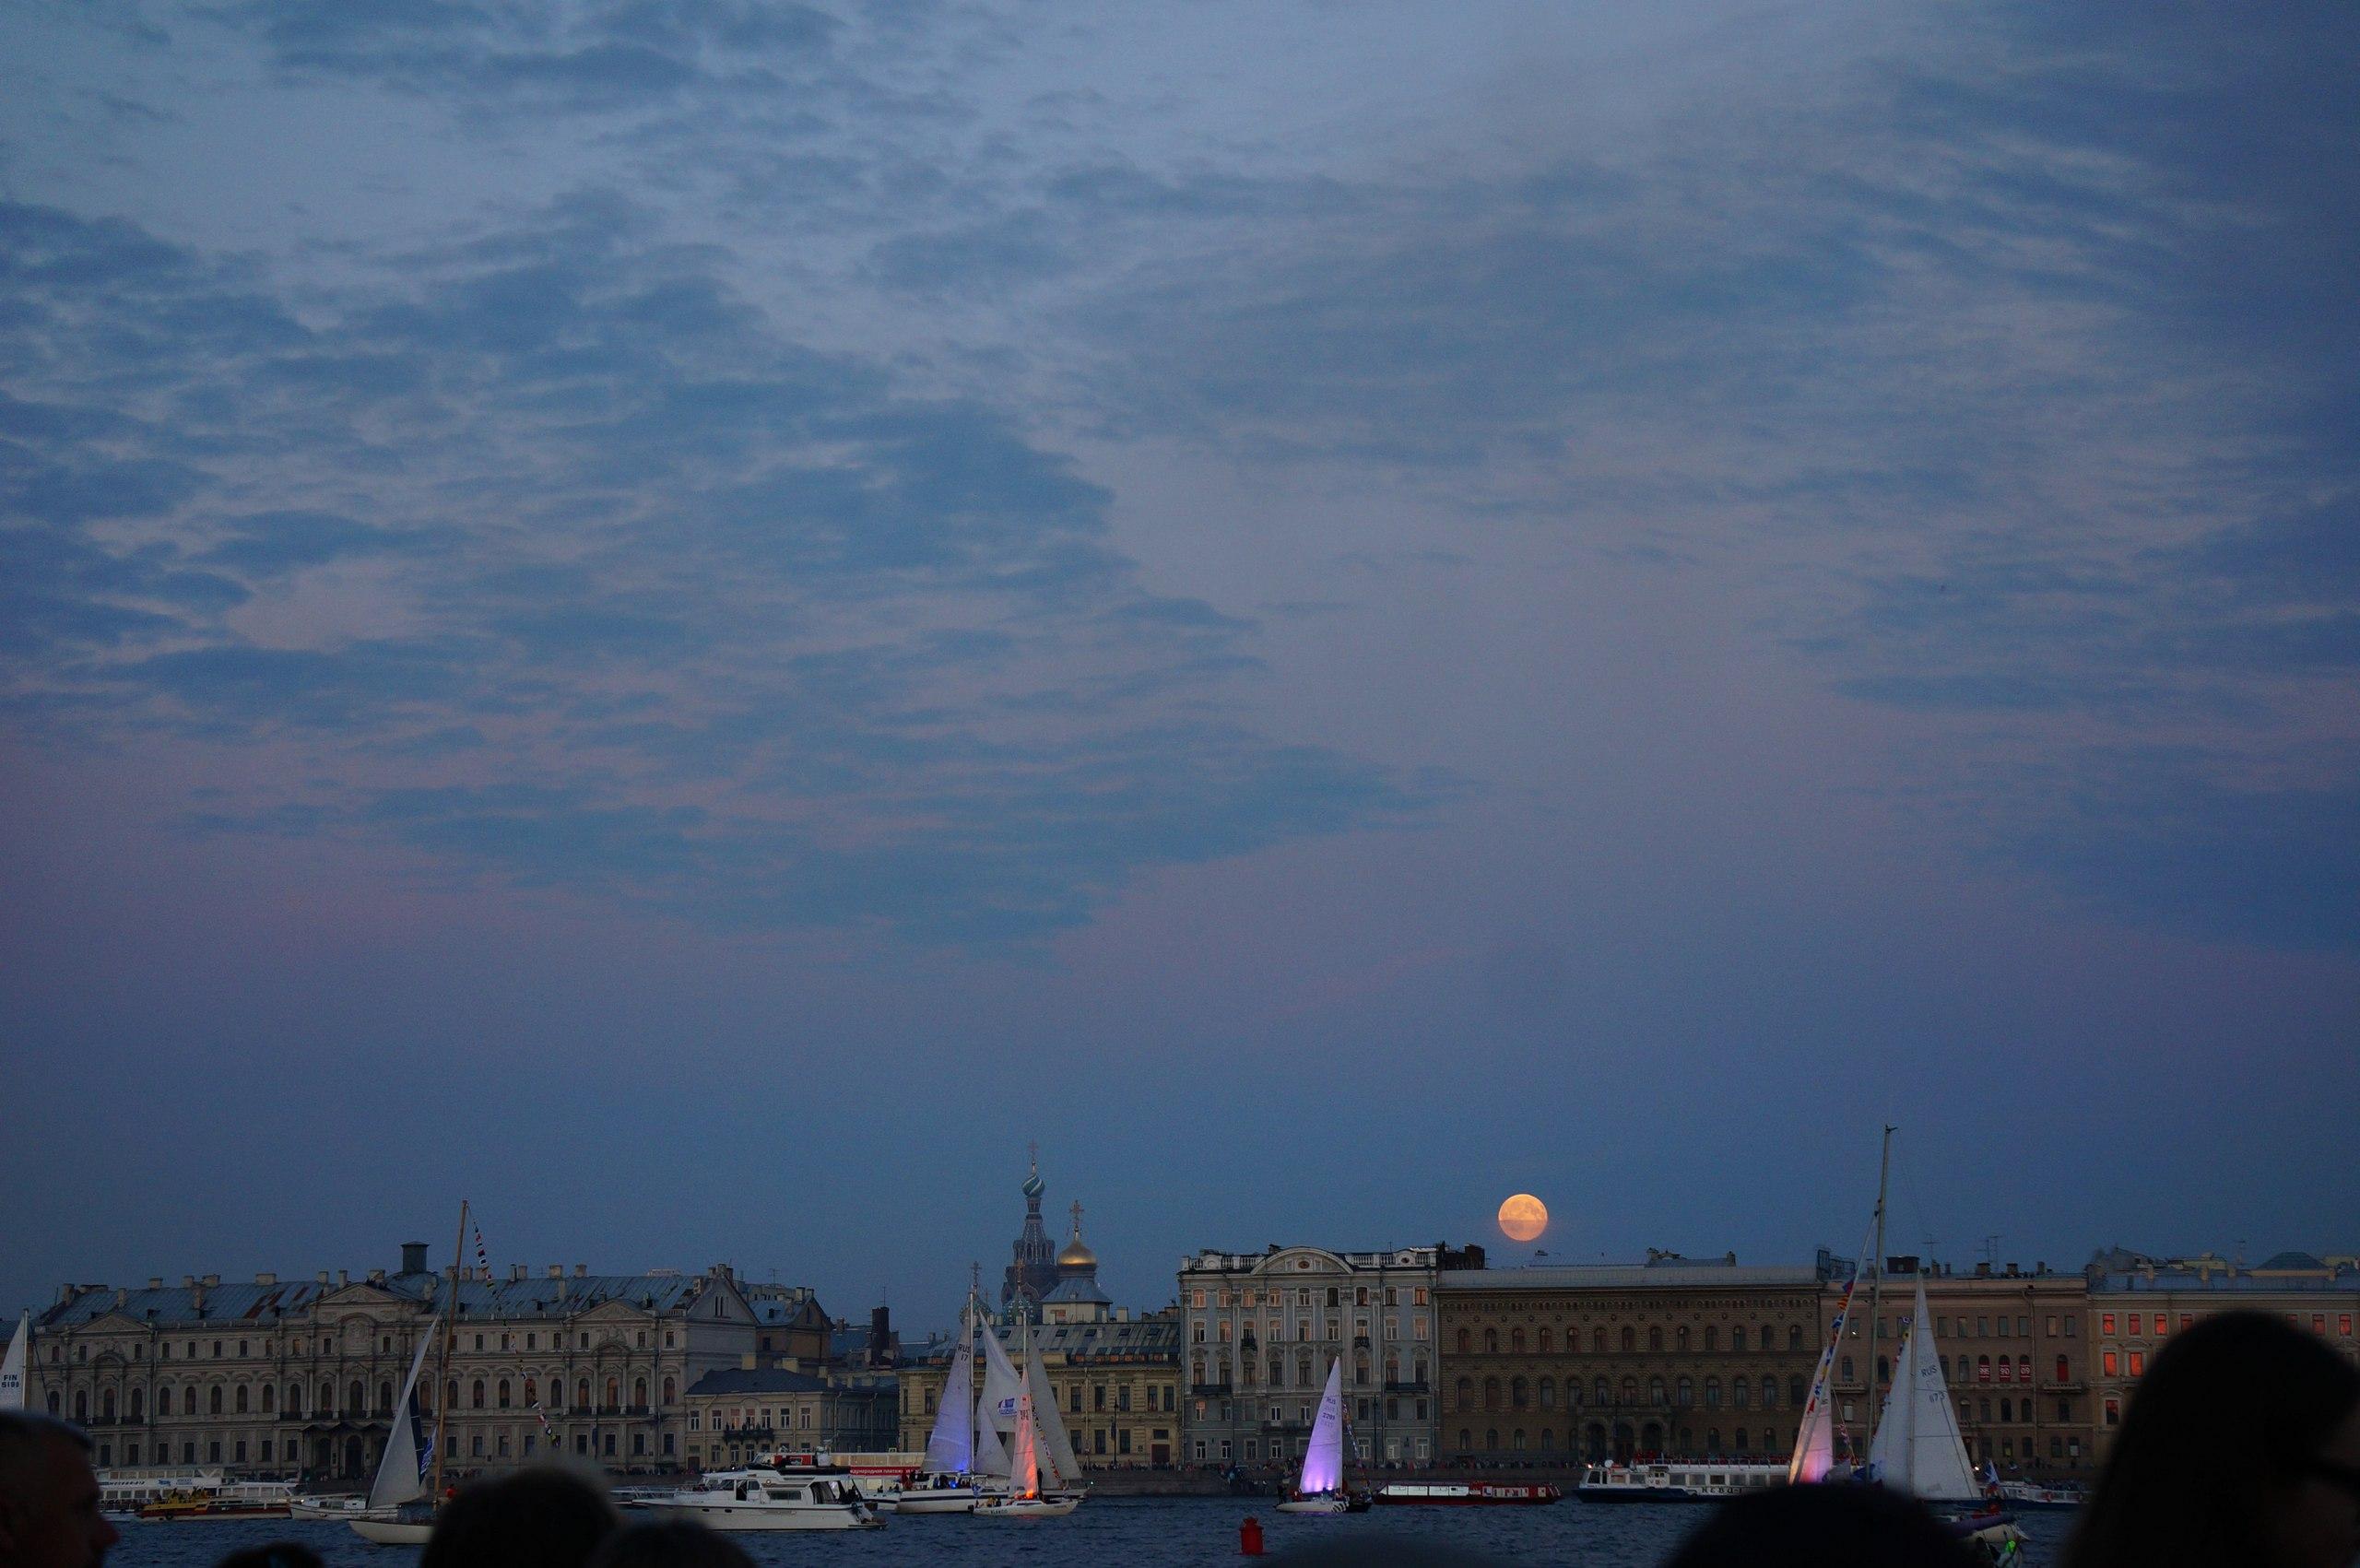 Санкт-Петербург шоу яхт июль 2017. Блиц: Санкт-Петербург